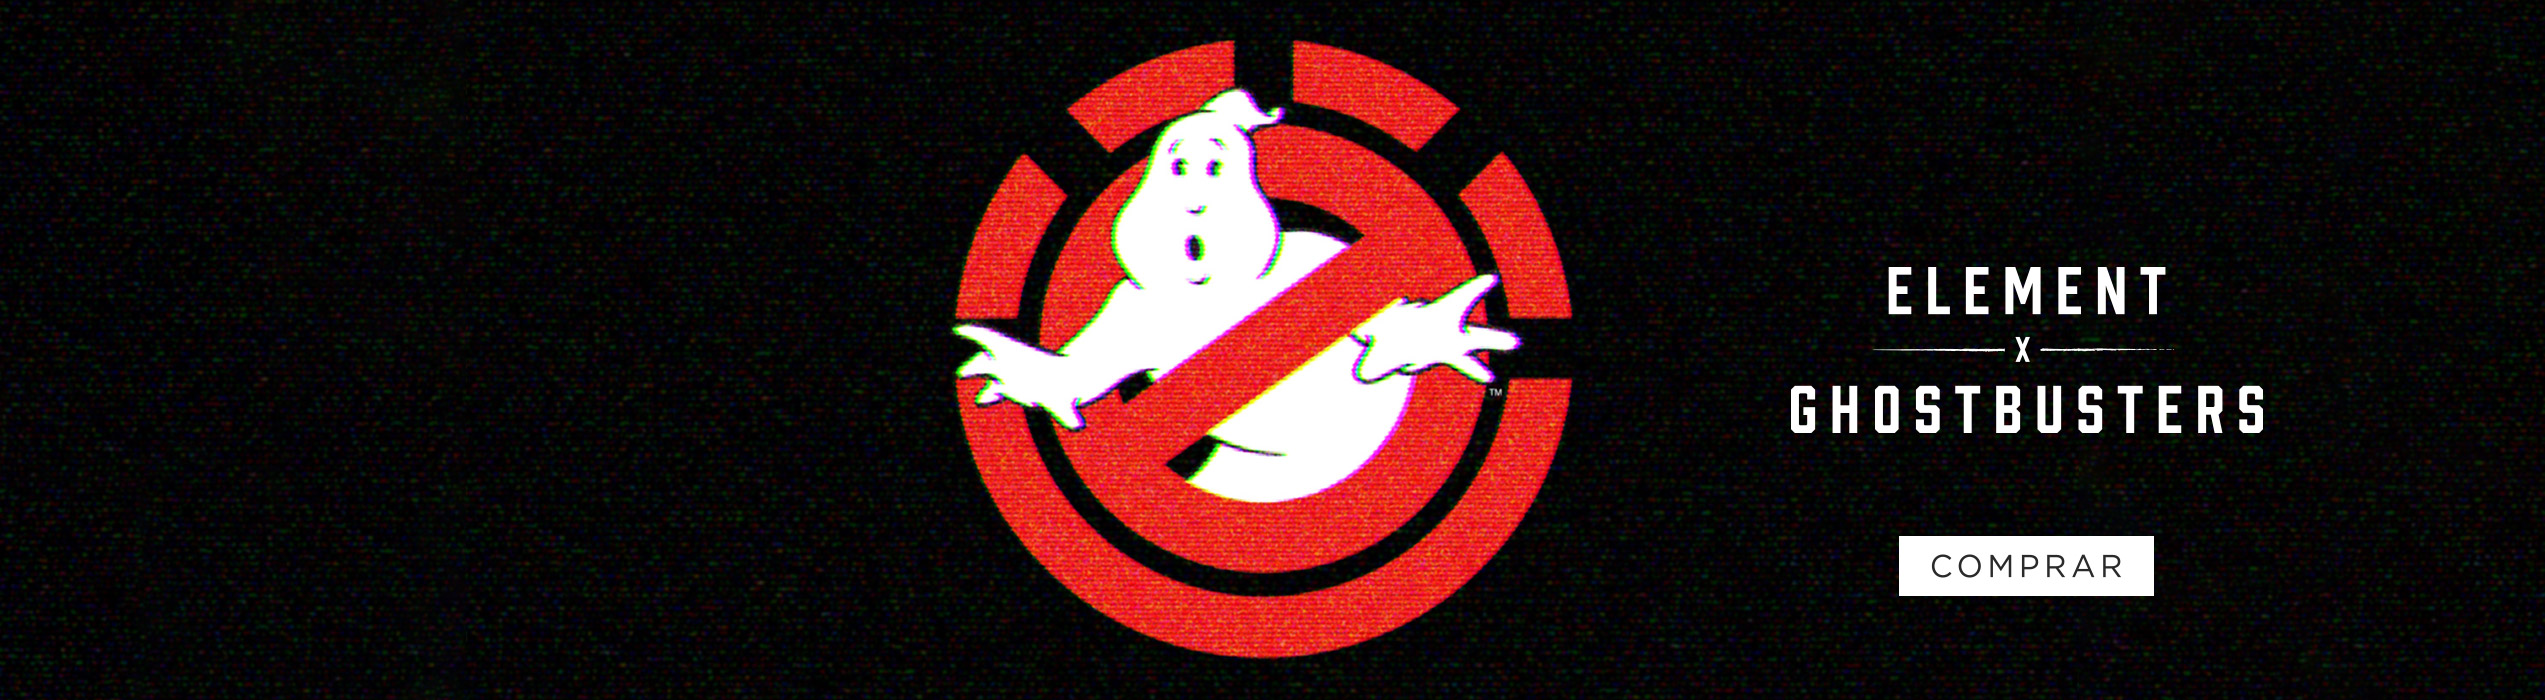 ESS_ELM_Ghostbusters-PT